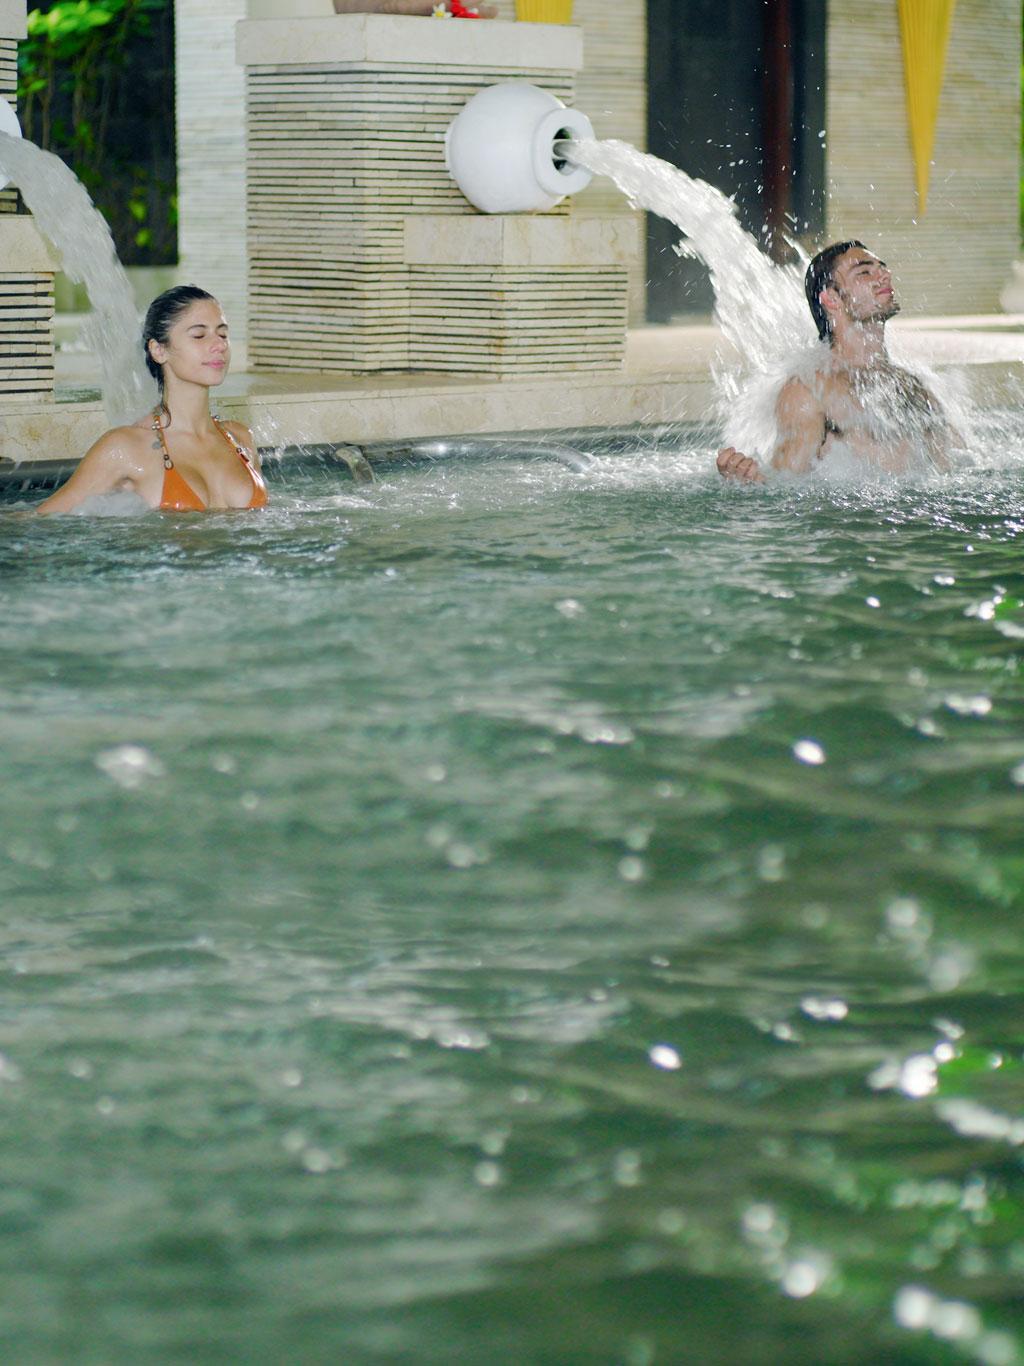 Bali Resort All Inclusive Grand Mirage Beachfront Resorts Paket Watersports Tanjung Benoa Include Lunch Thalasso